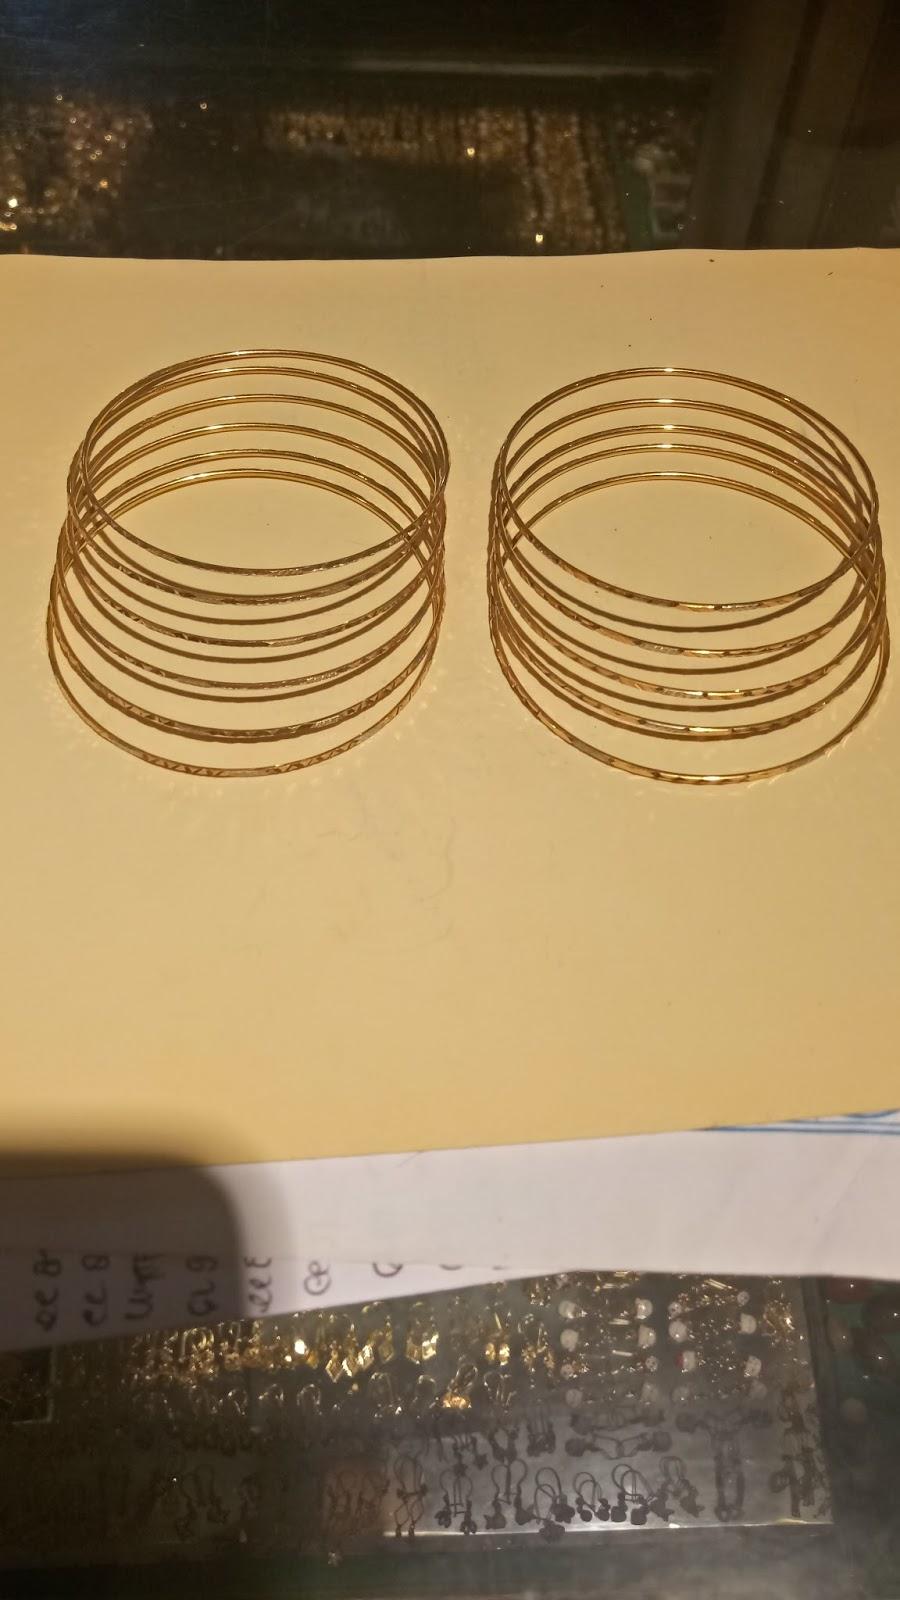 Harga Cincin Tunangan: Model Gelang Emas Kuning Terbaru ...